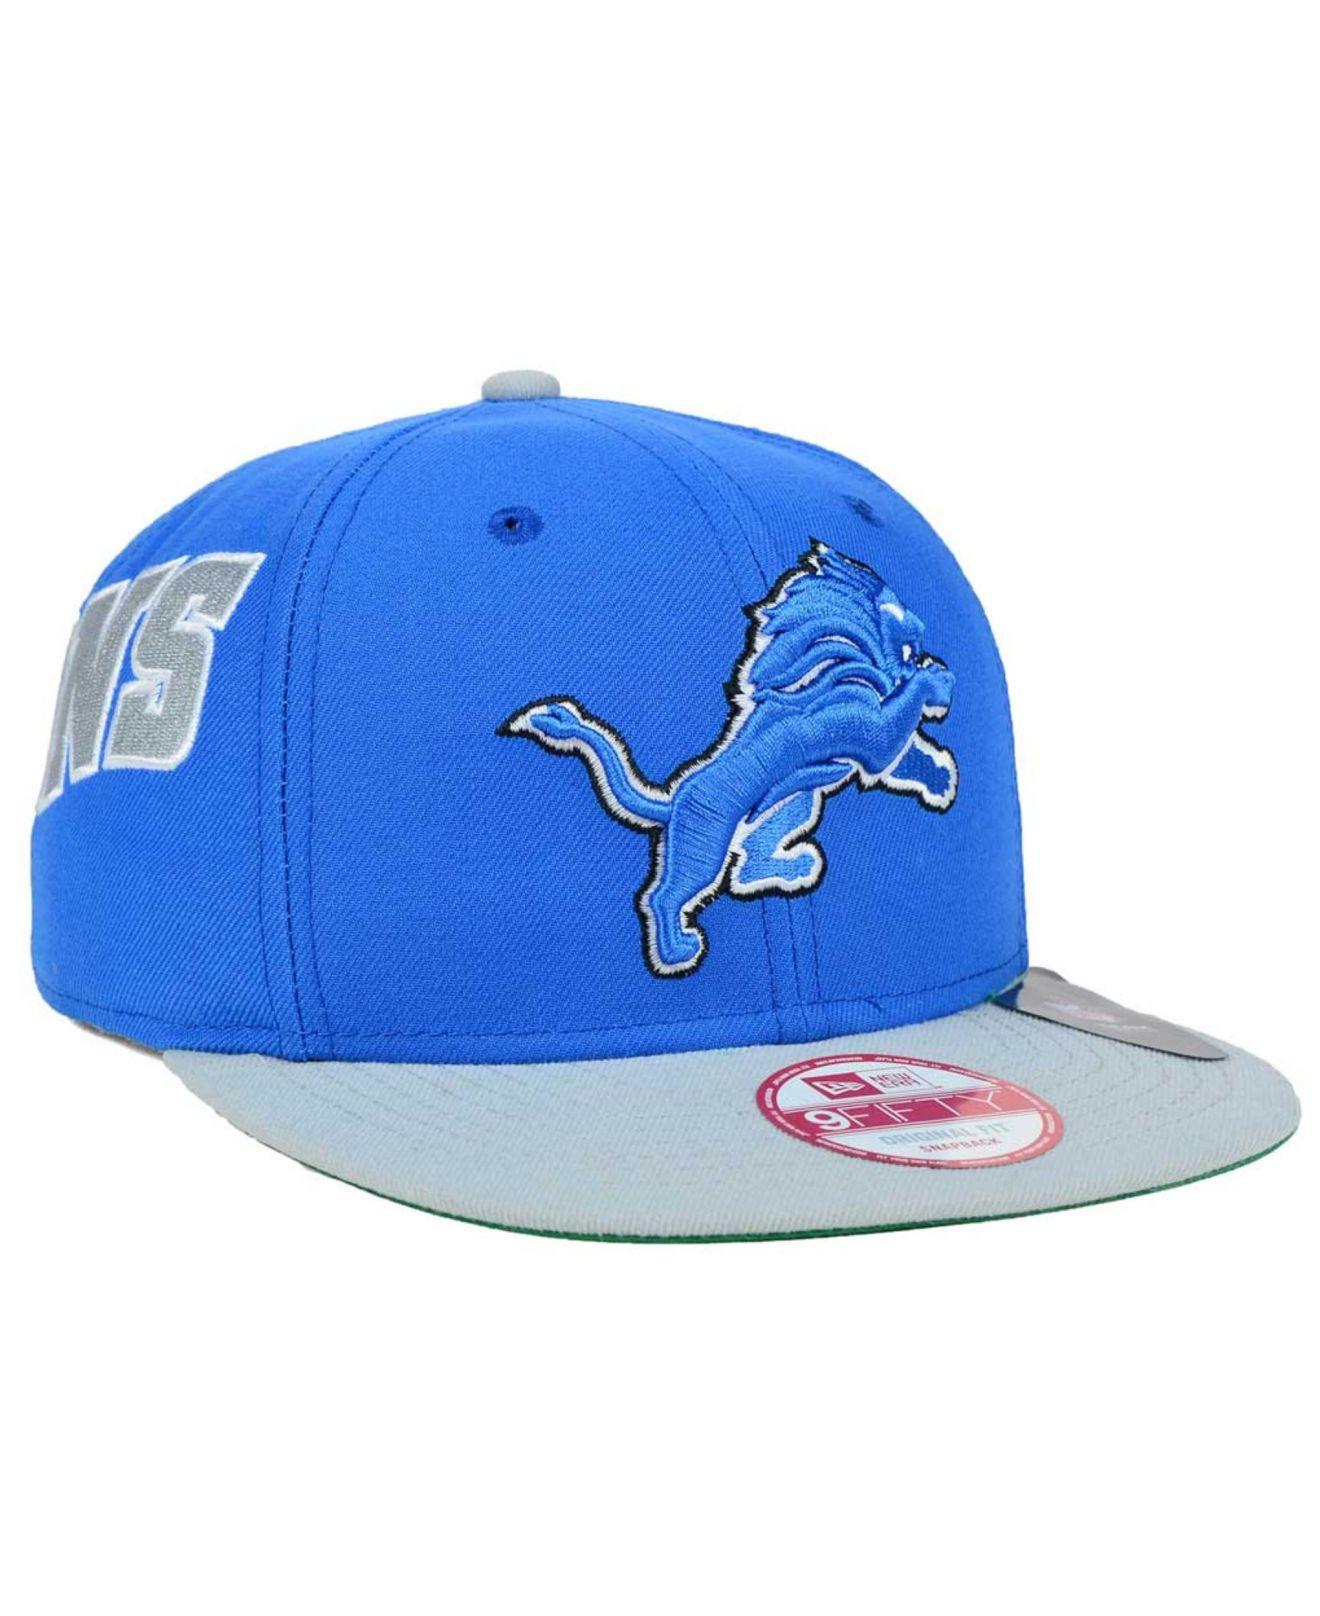 dd84c8550e7 Lyst - Ktz Detroit Lions Swerve 9fifty Snapback Cap in Blue for Men